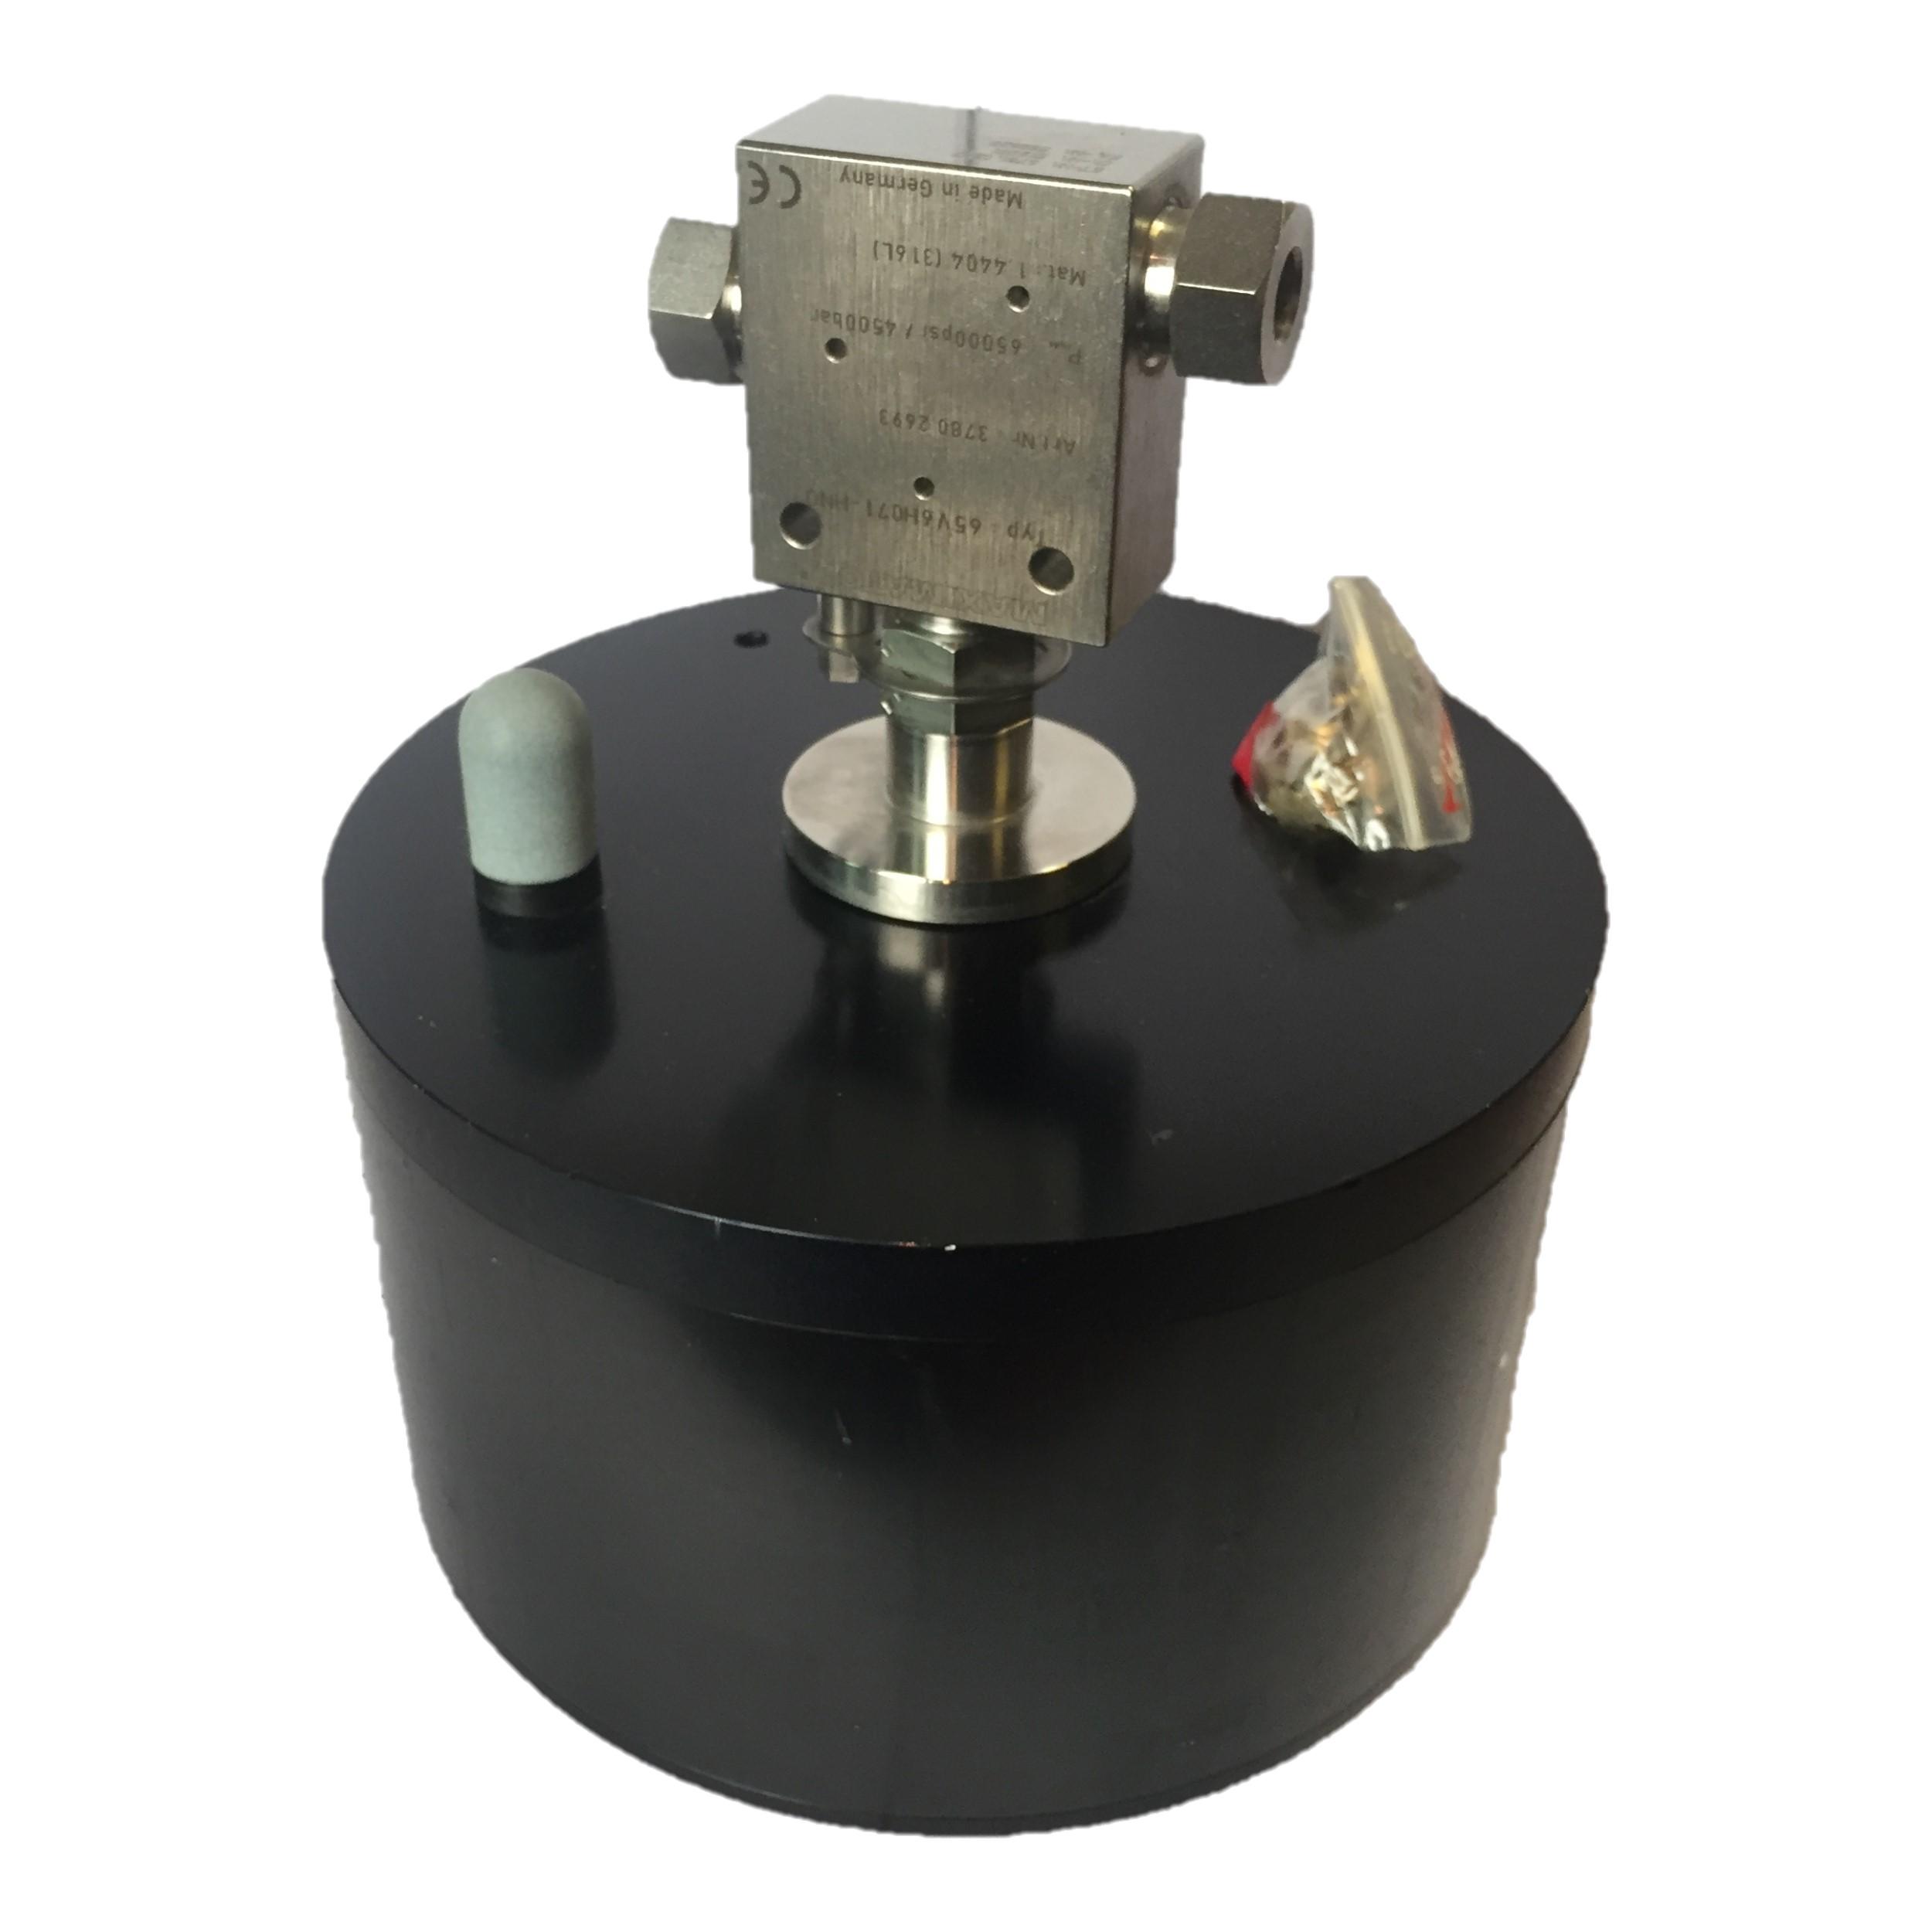 شیر فشار قوی ماکسیماتور مدل 65V6H071HN0